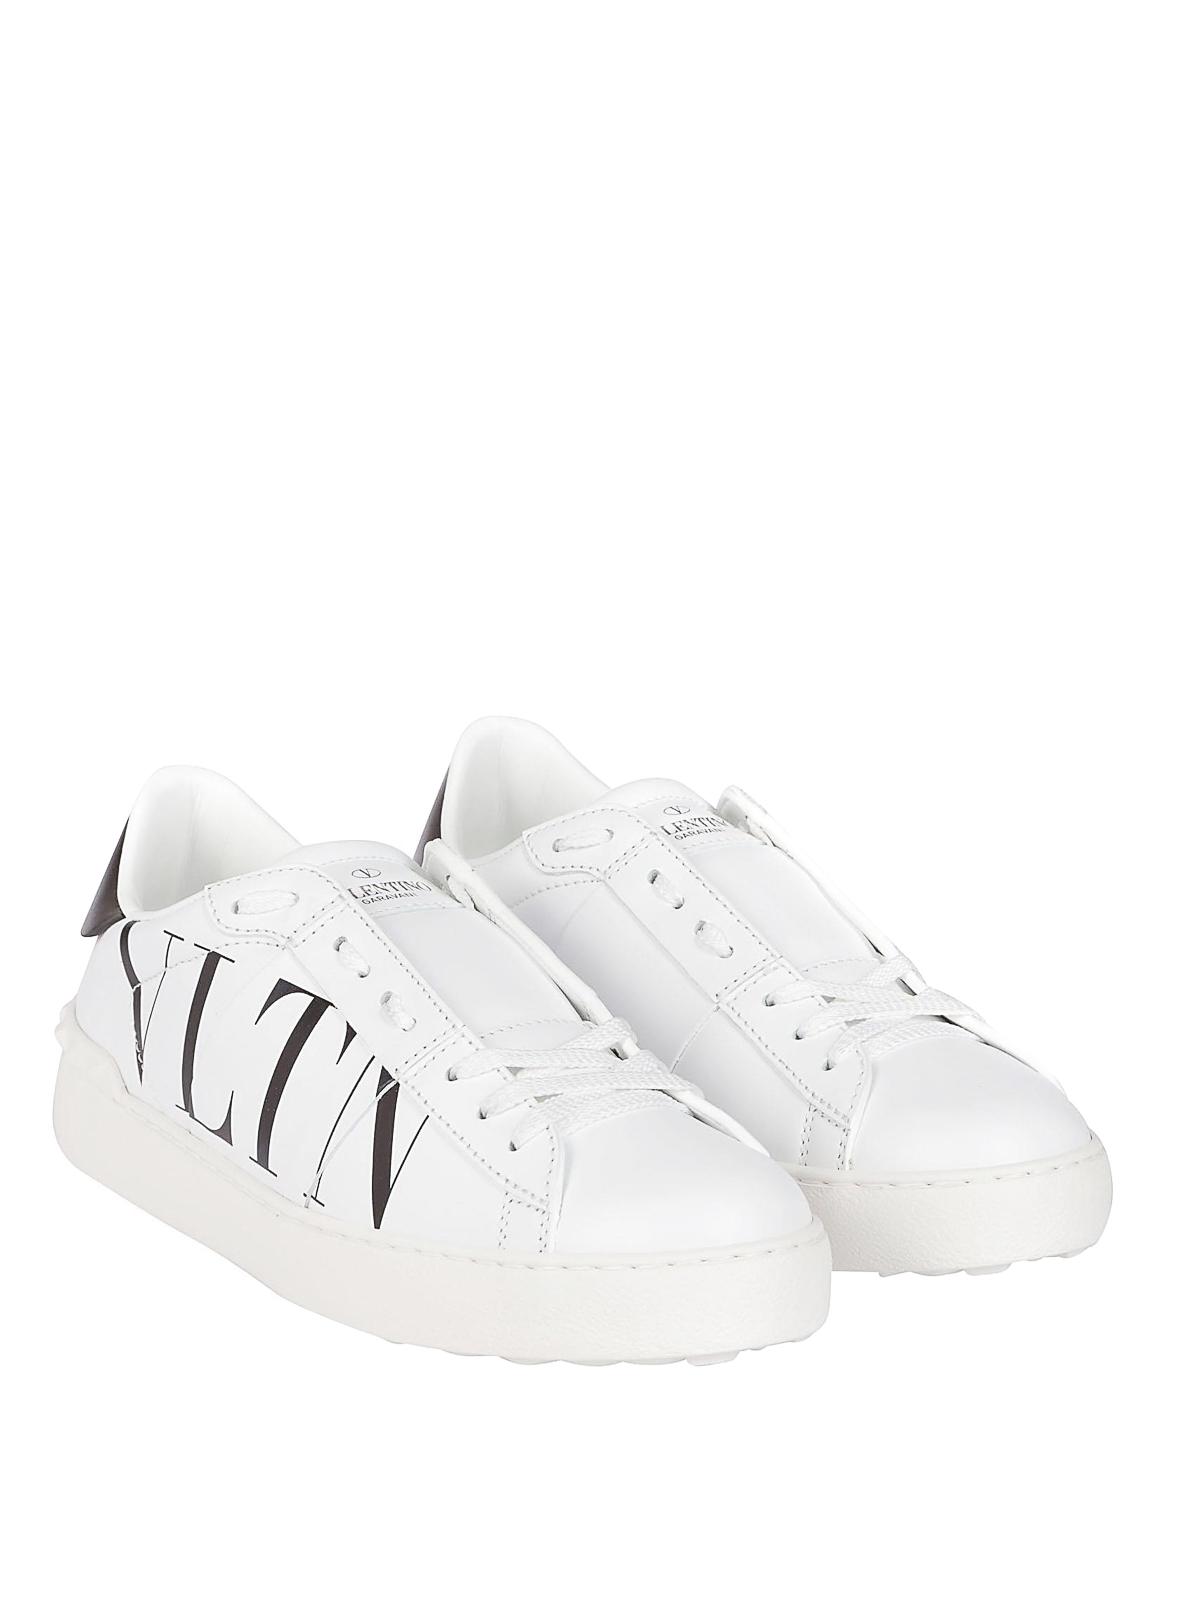 VALENTINO GARAVANI  trainers online - VLTN white leather low top sneakers c474b017da2